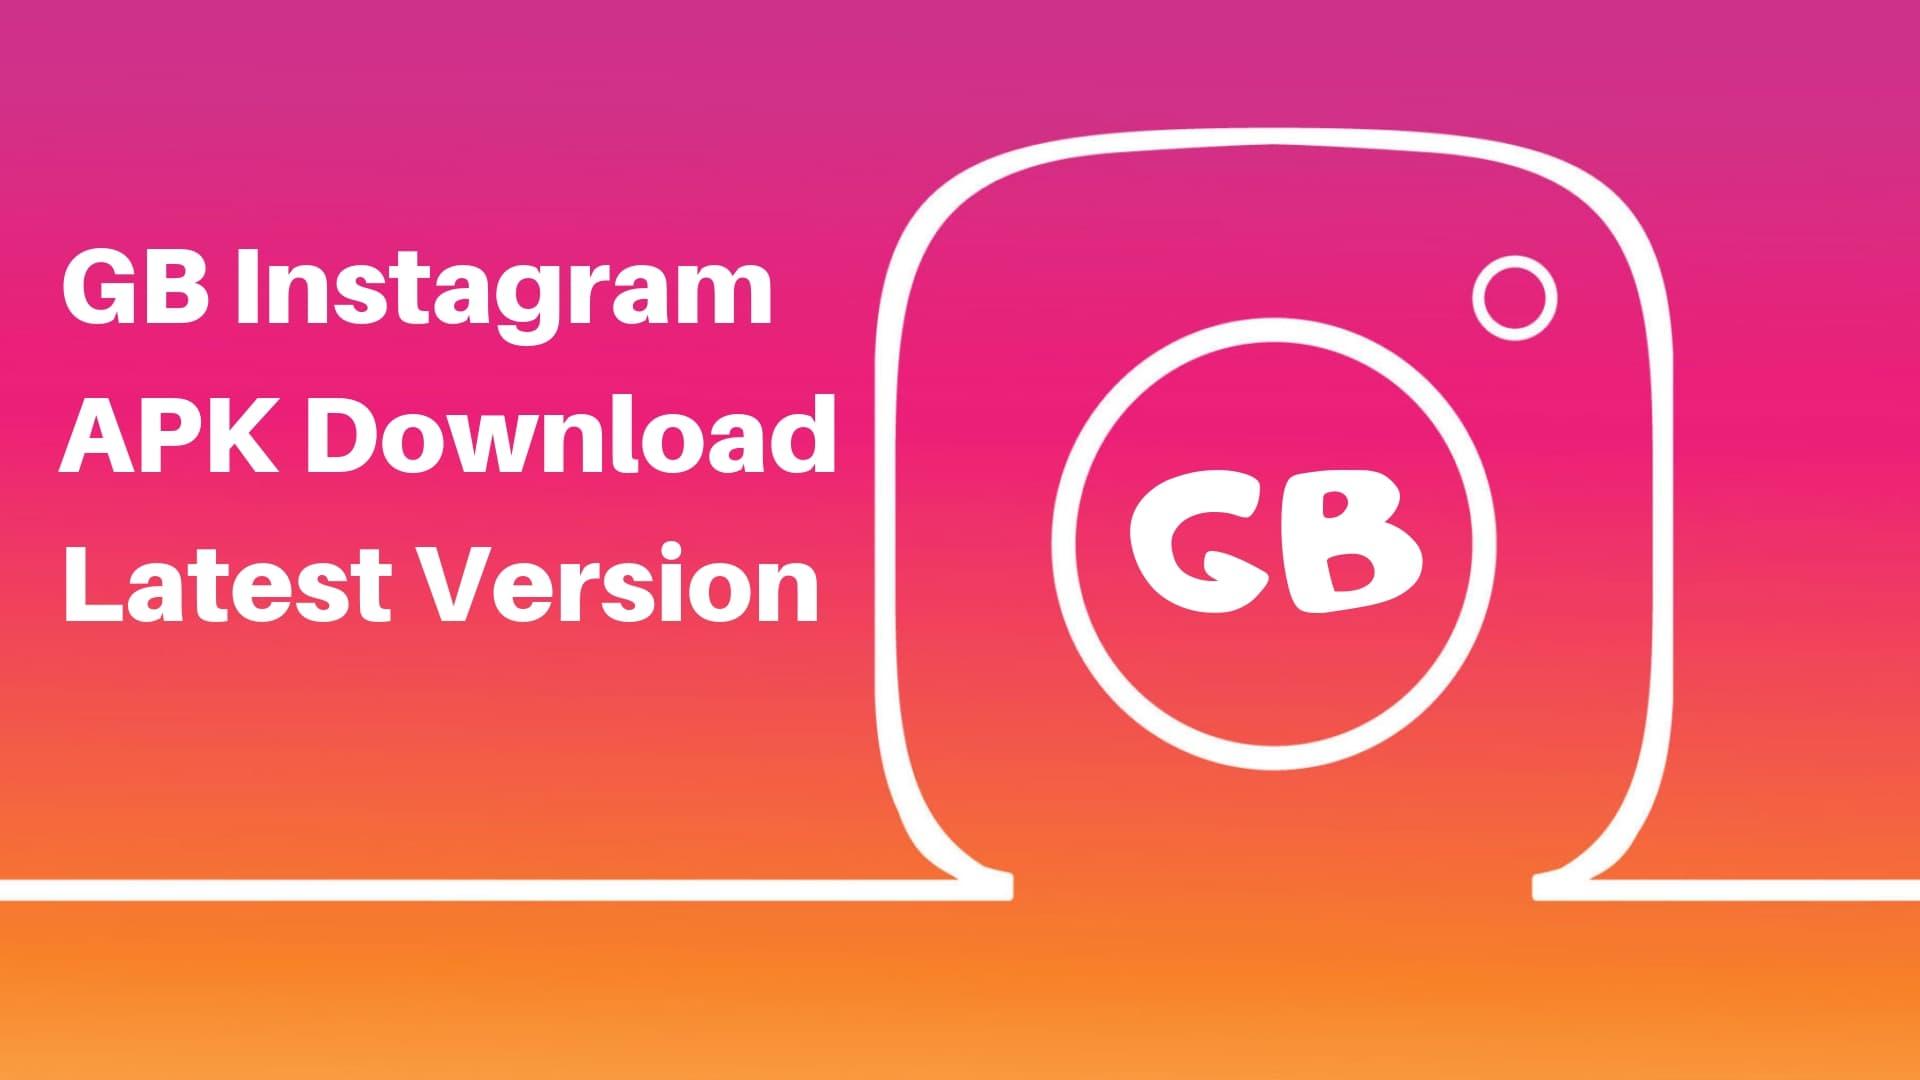 GB Instagram APK Download Latest Version